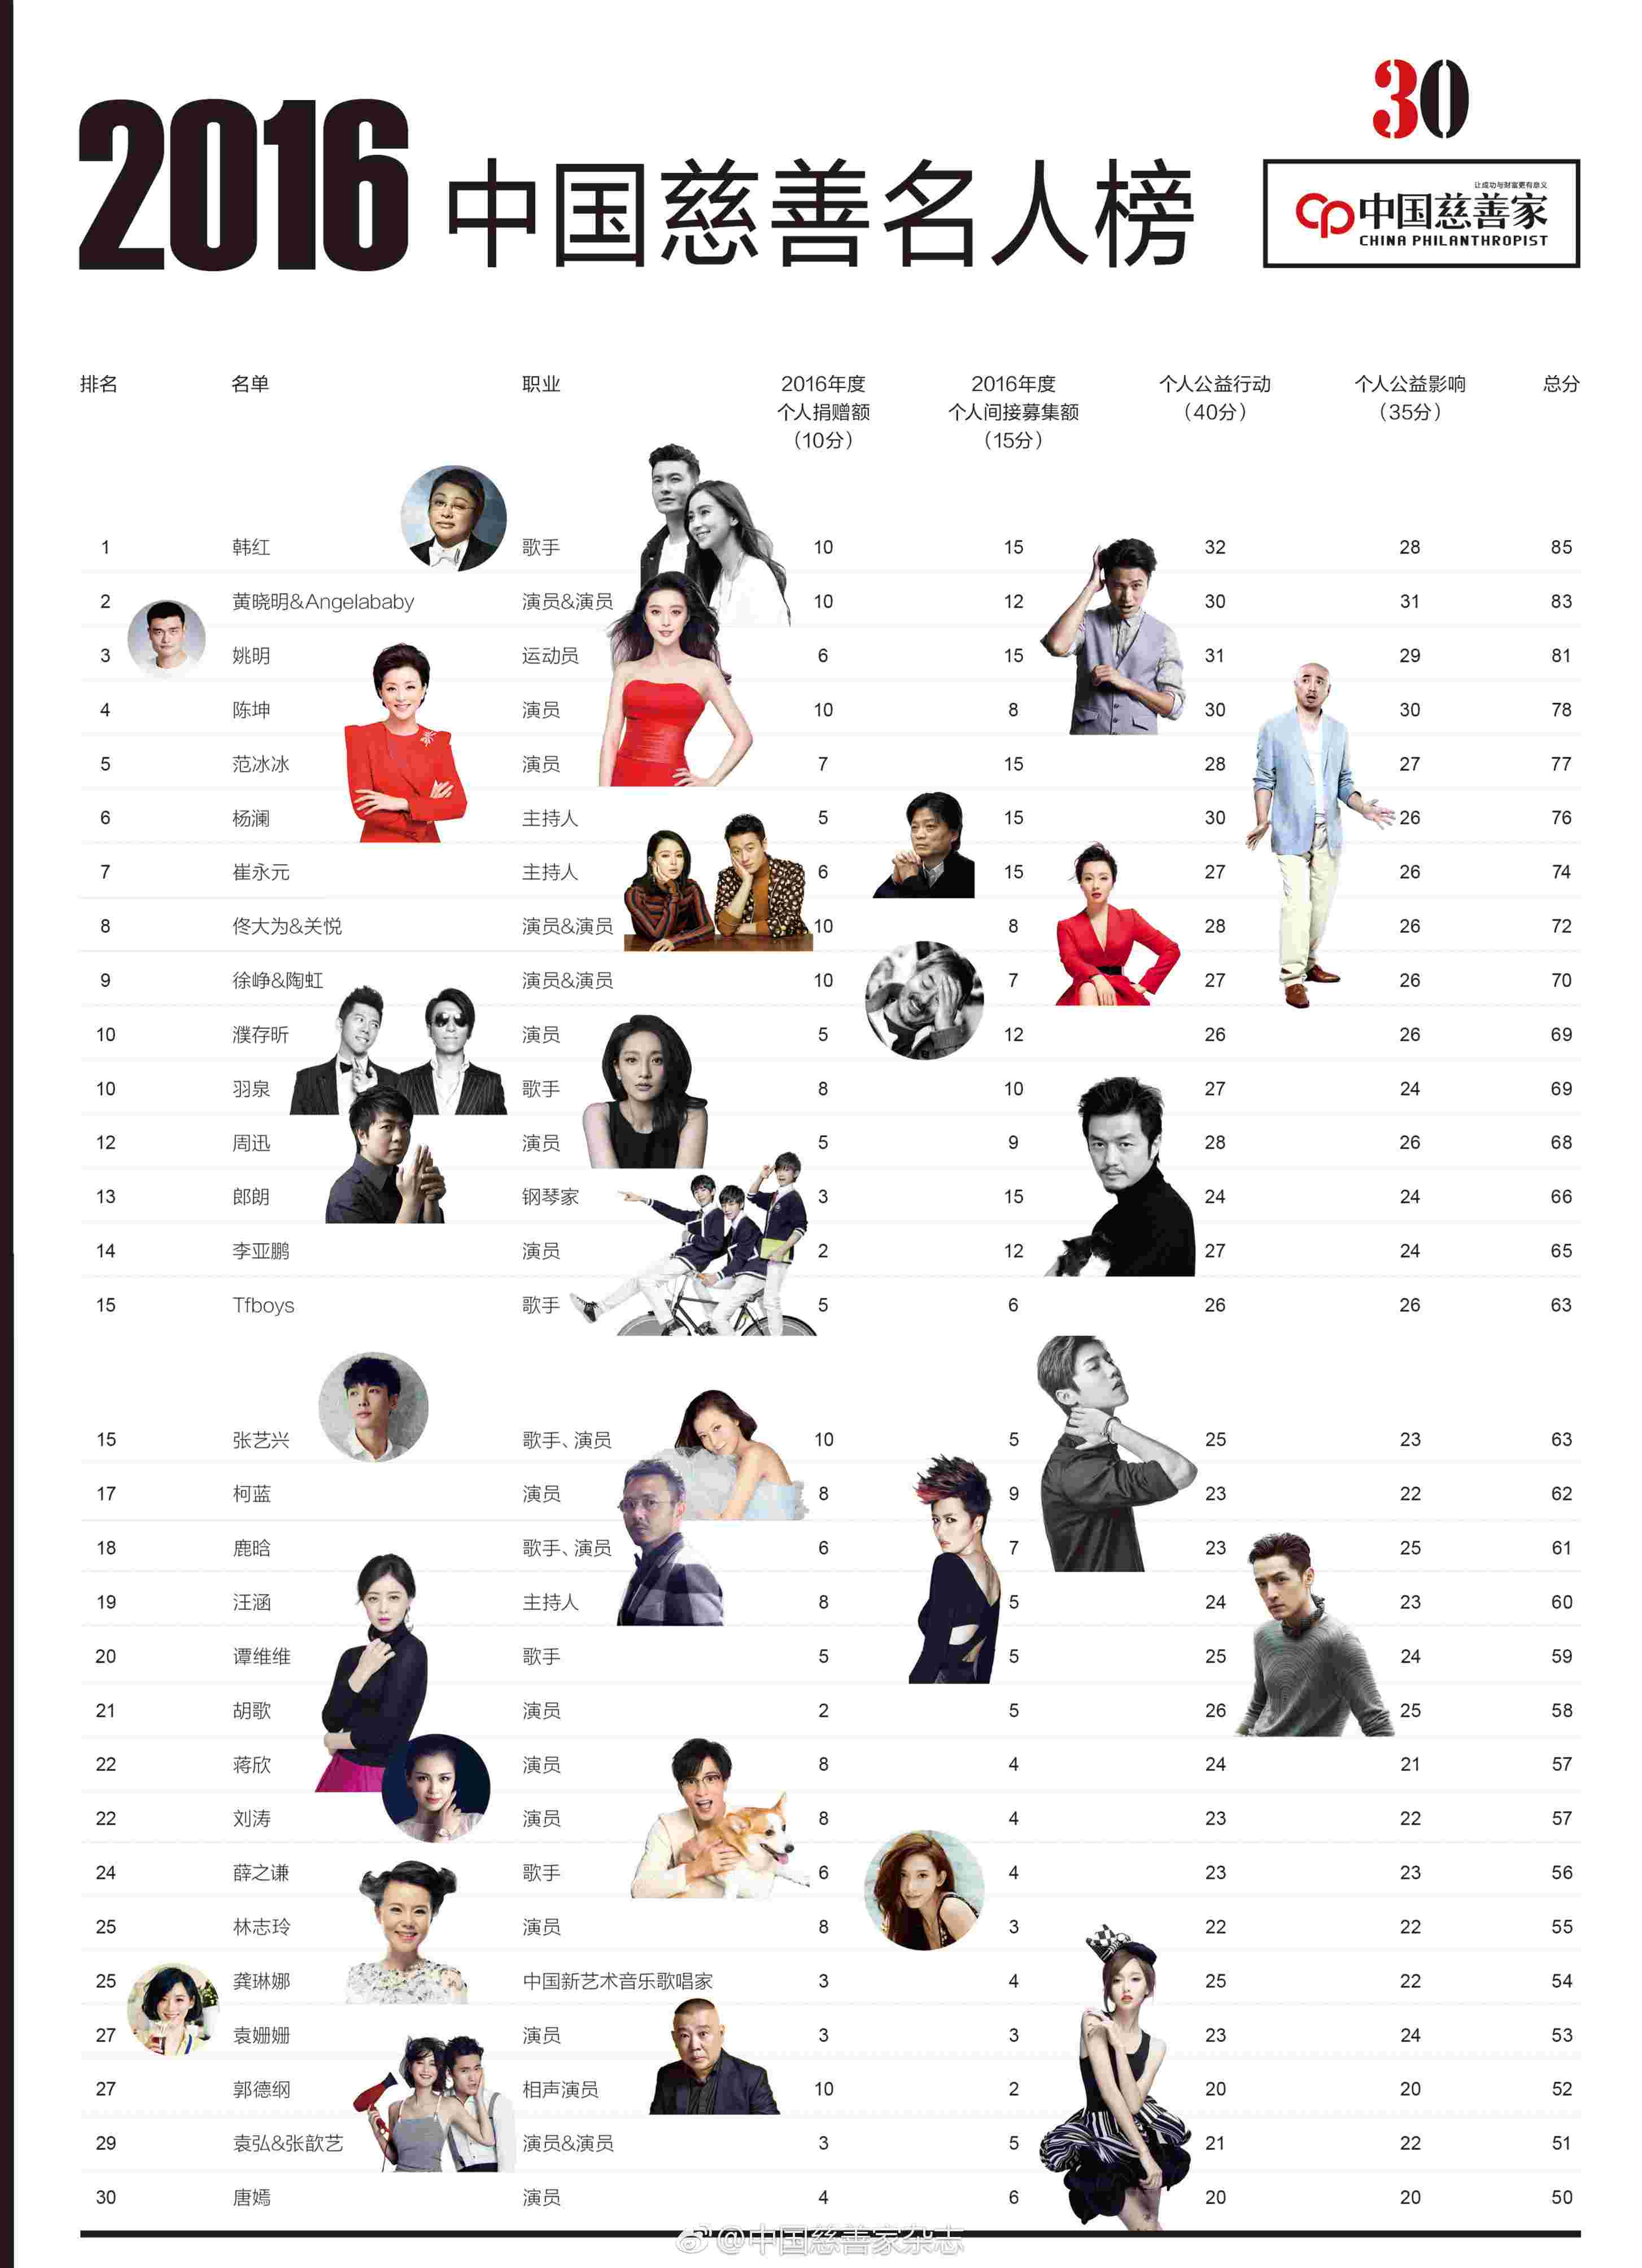 Angelababy黄晓明夫妇获2016年中国慈善名人榜第二名.jpg